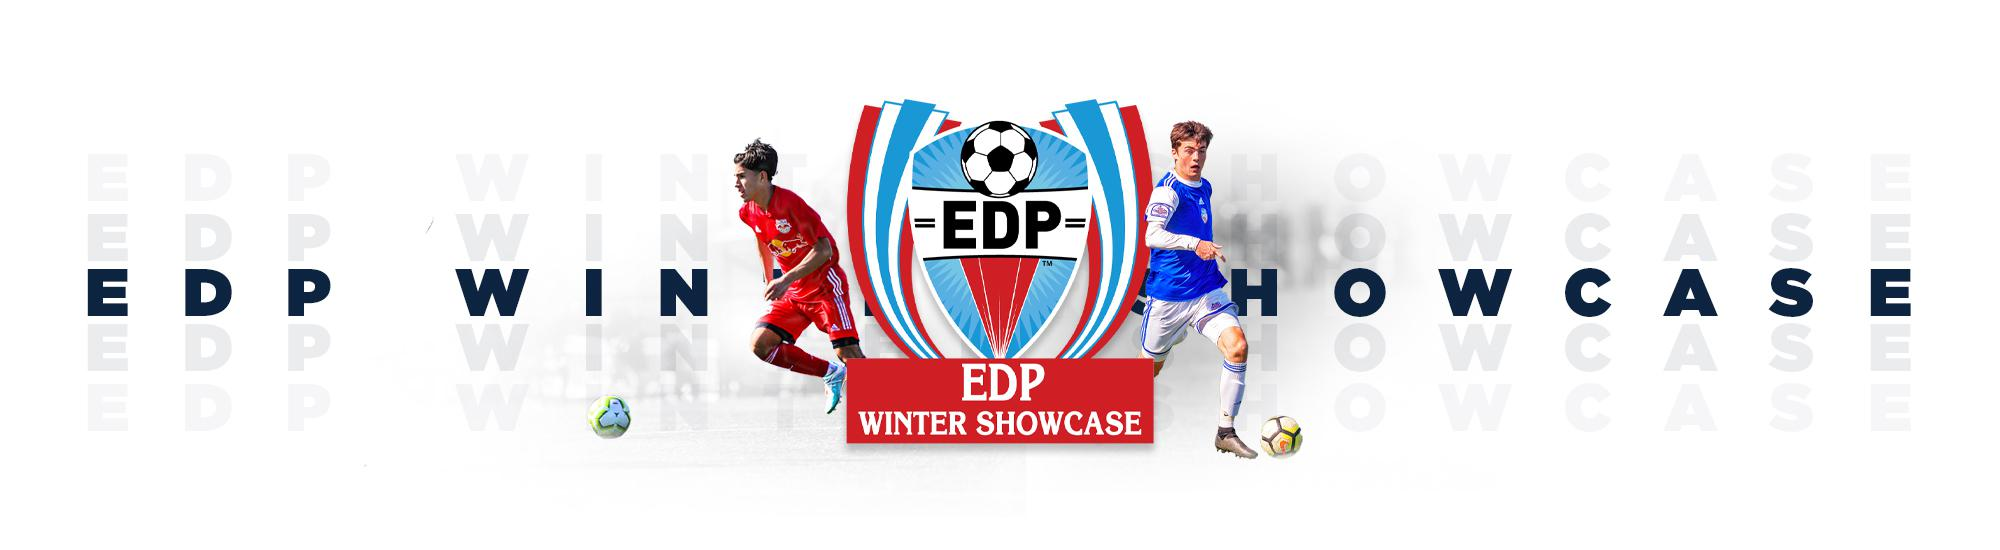 EDP Winter Showcase